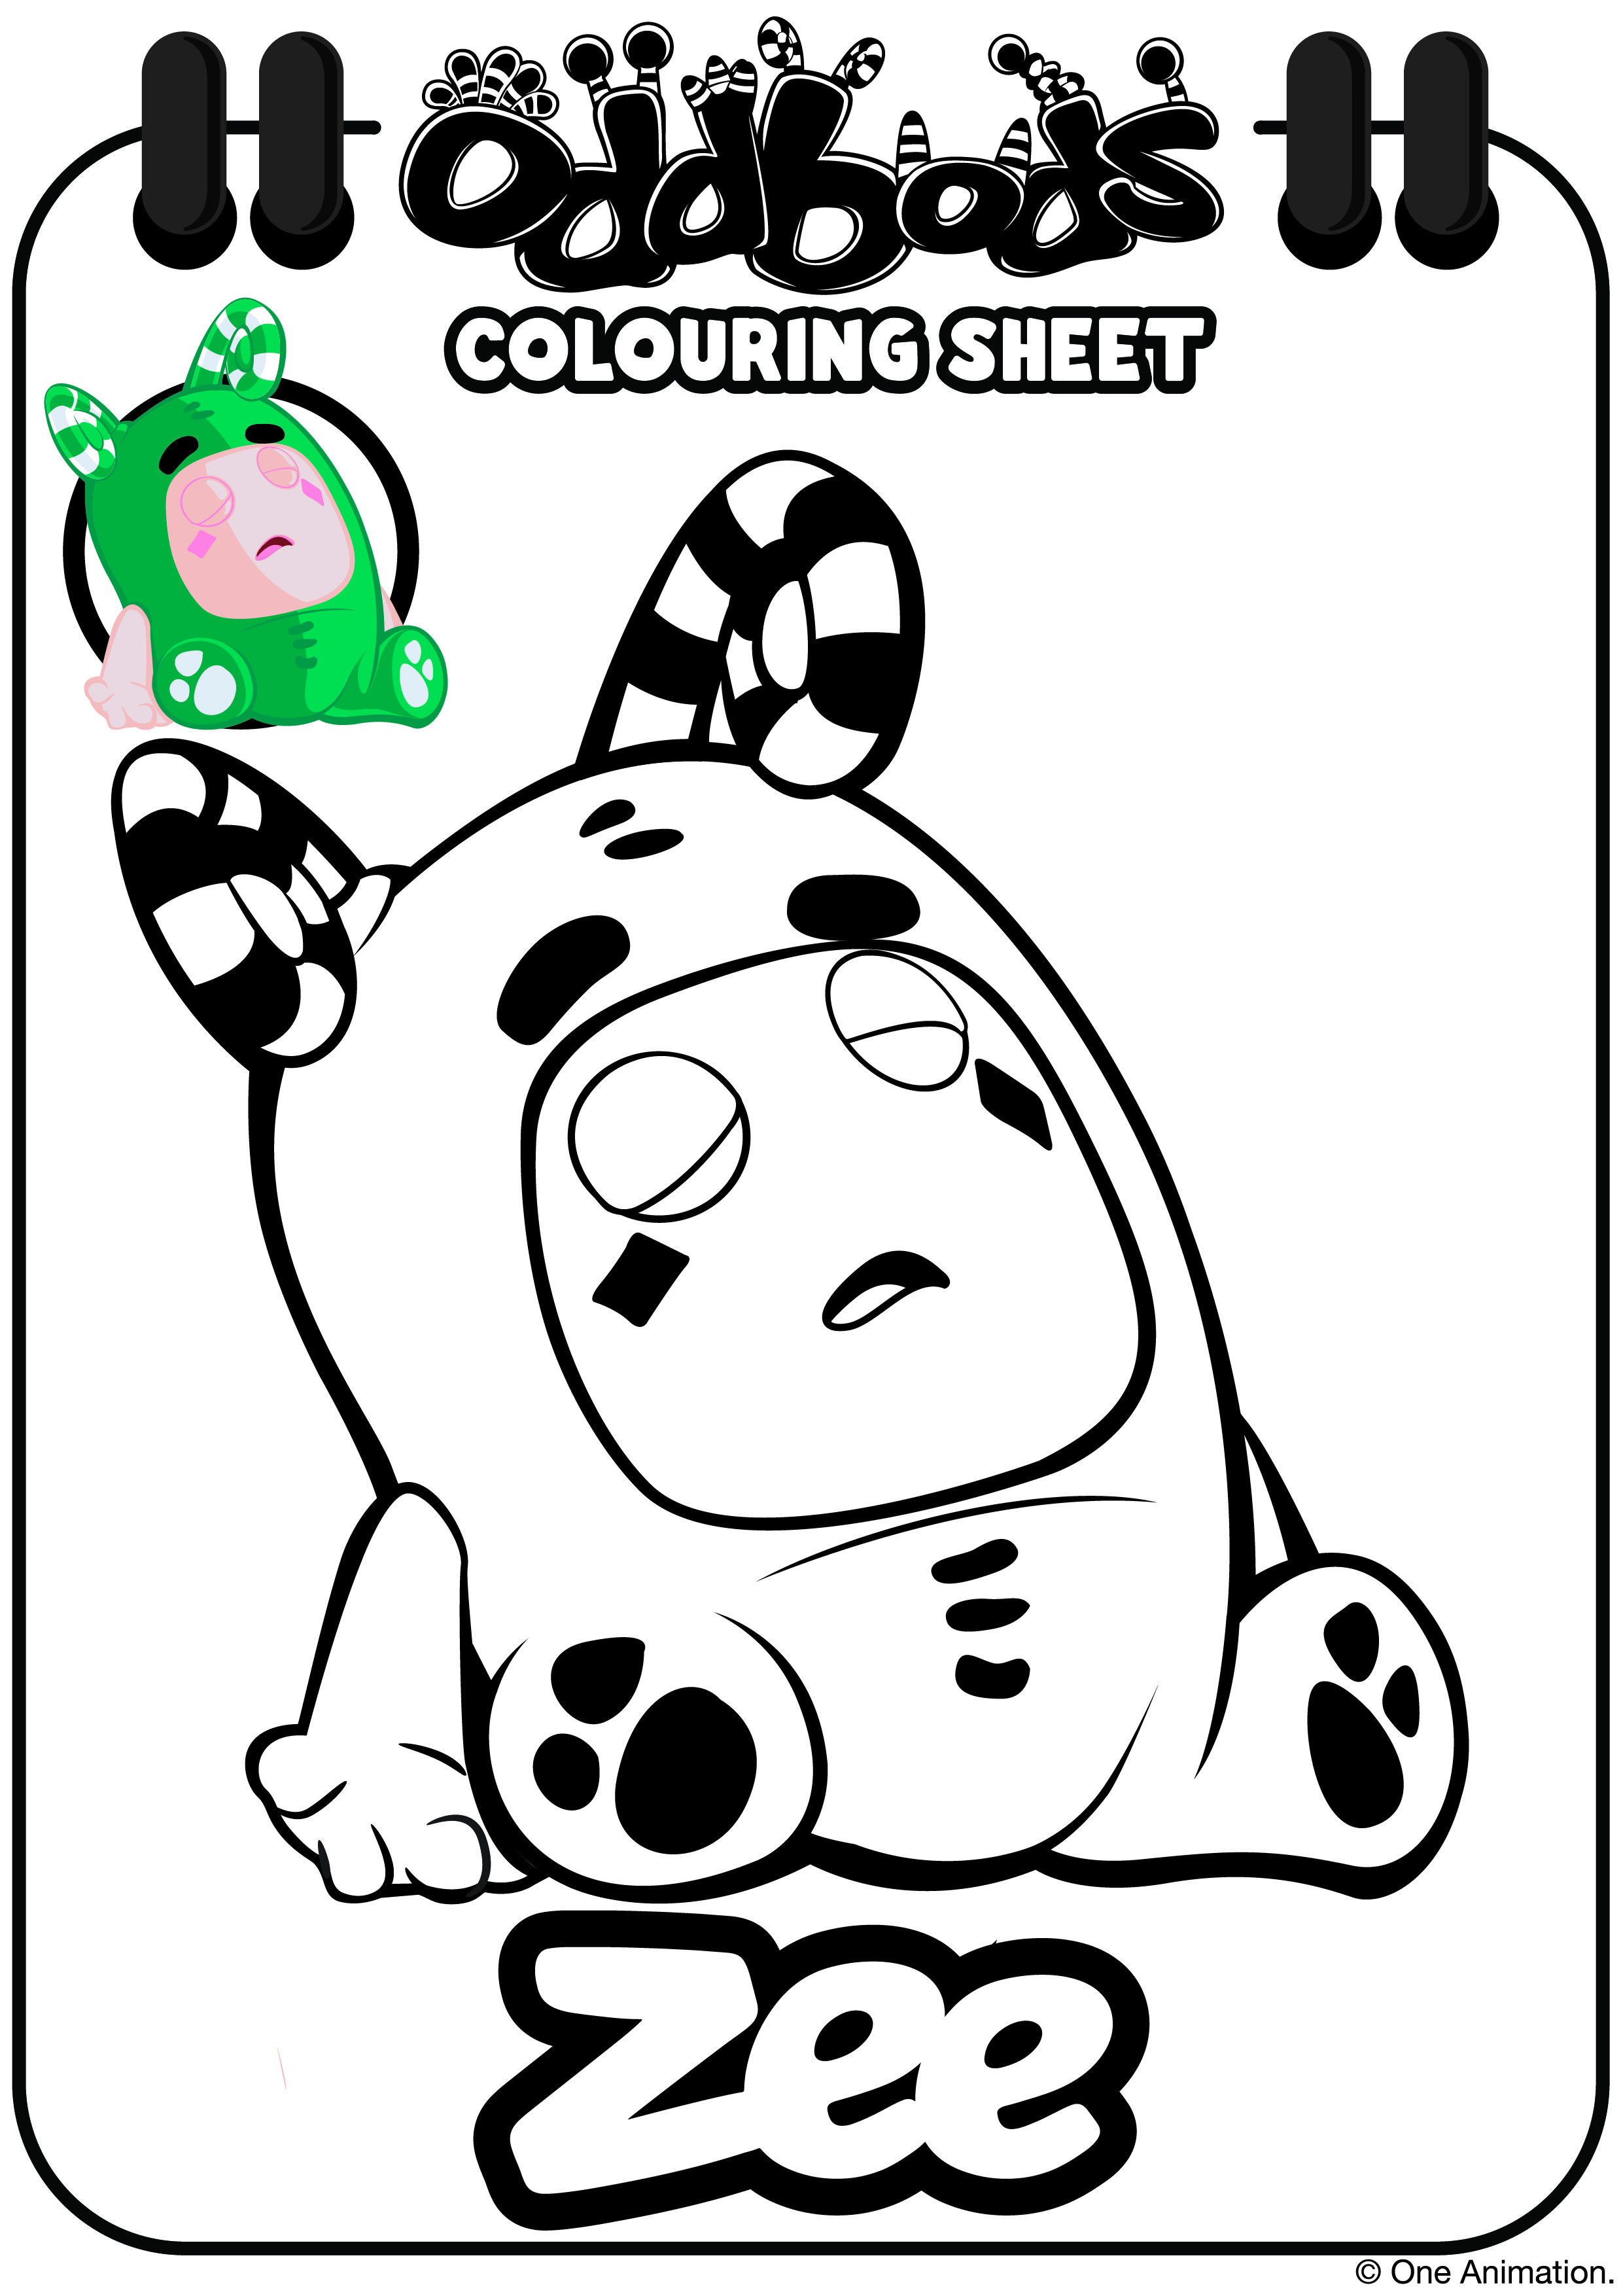 Oddbods Colouring Sheet